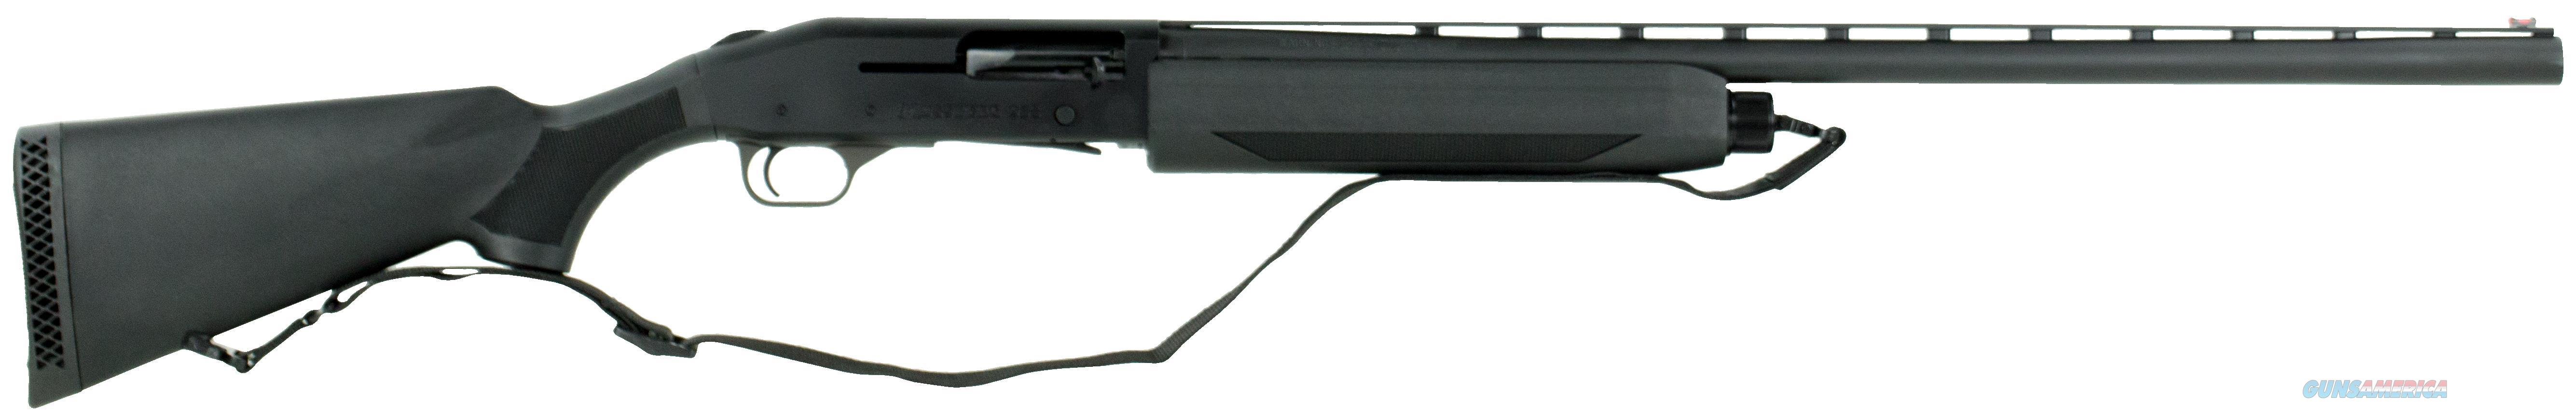 "Mossberg 81000 935 Magnum Waterfowl Sa 12 Ga 28"" 3.5"" Synthetic Stk Black 81000  Guns > Shotguns > MN Misc Shotguns"